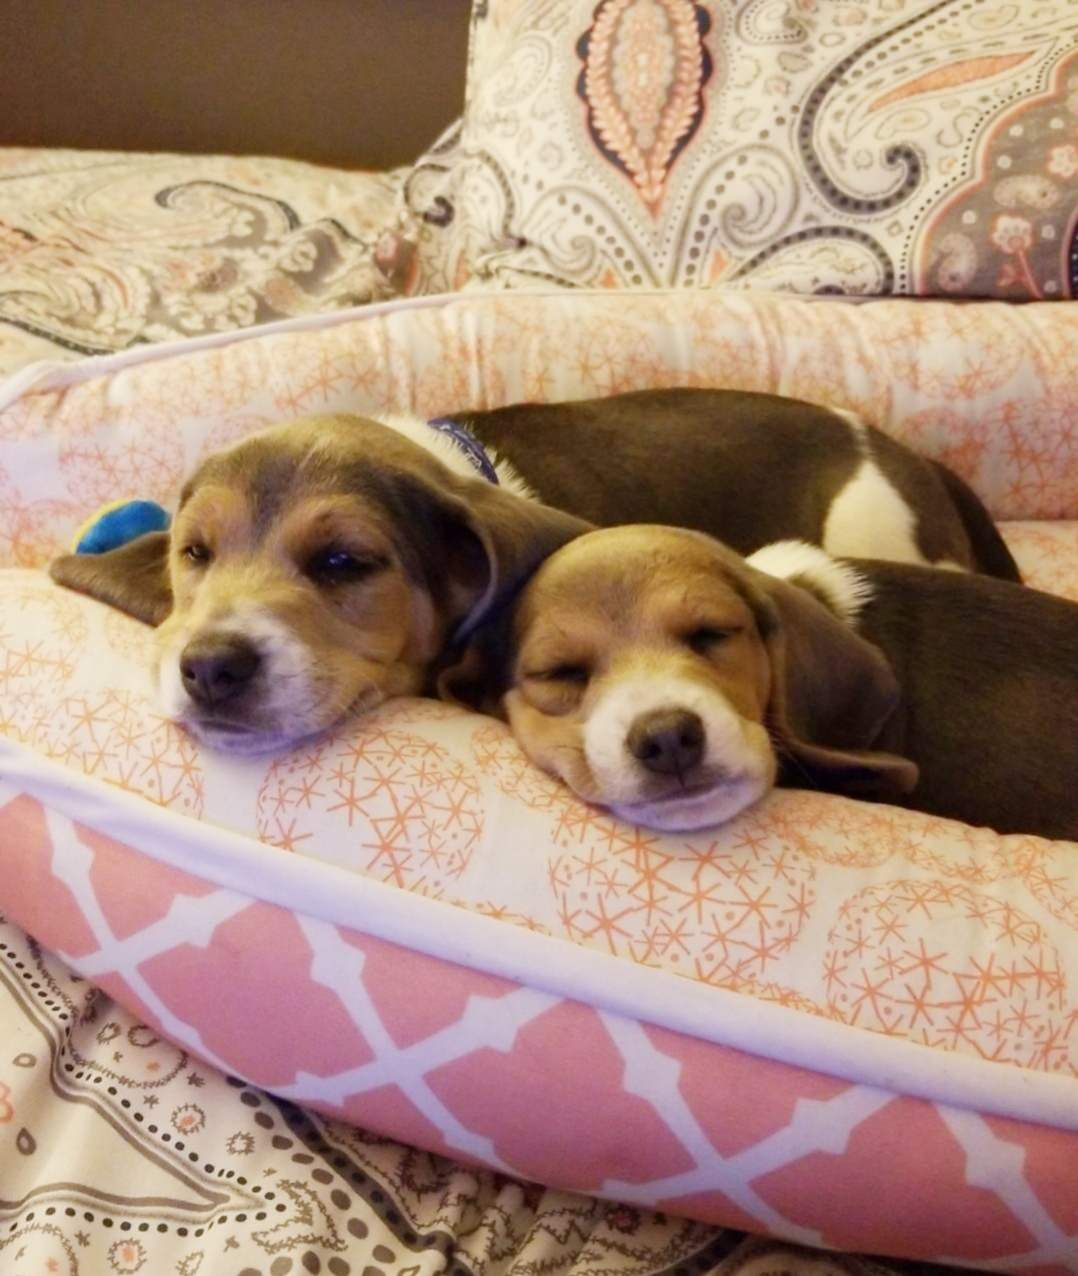 Top Two Beagle Adorable Dog - 0bcf54f65b4ebe8303189a856b2ae322  Gallery_361652  .jpg